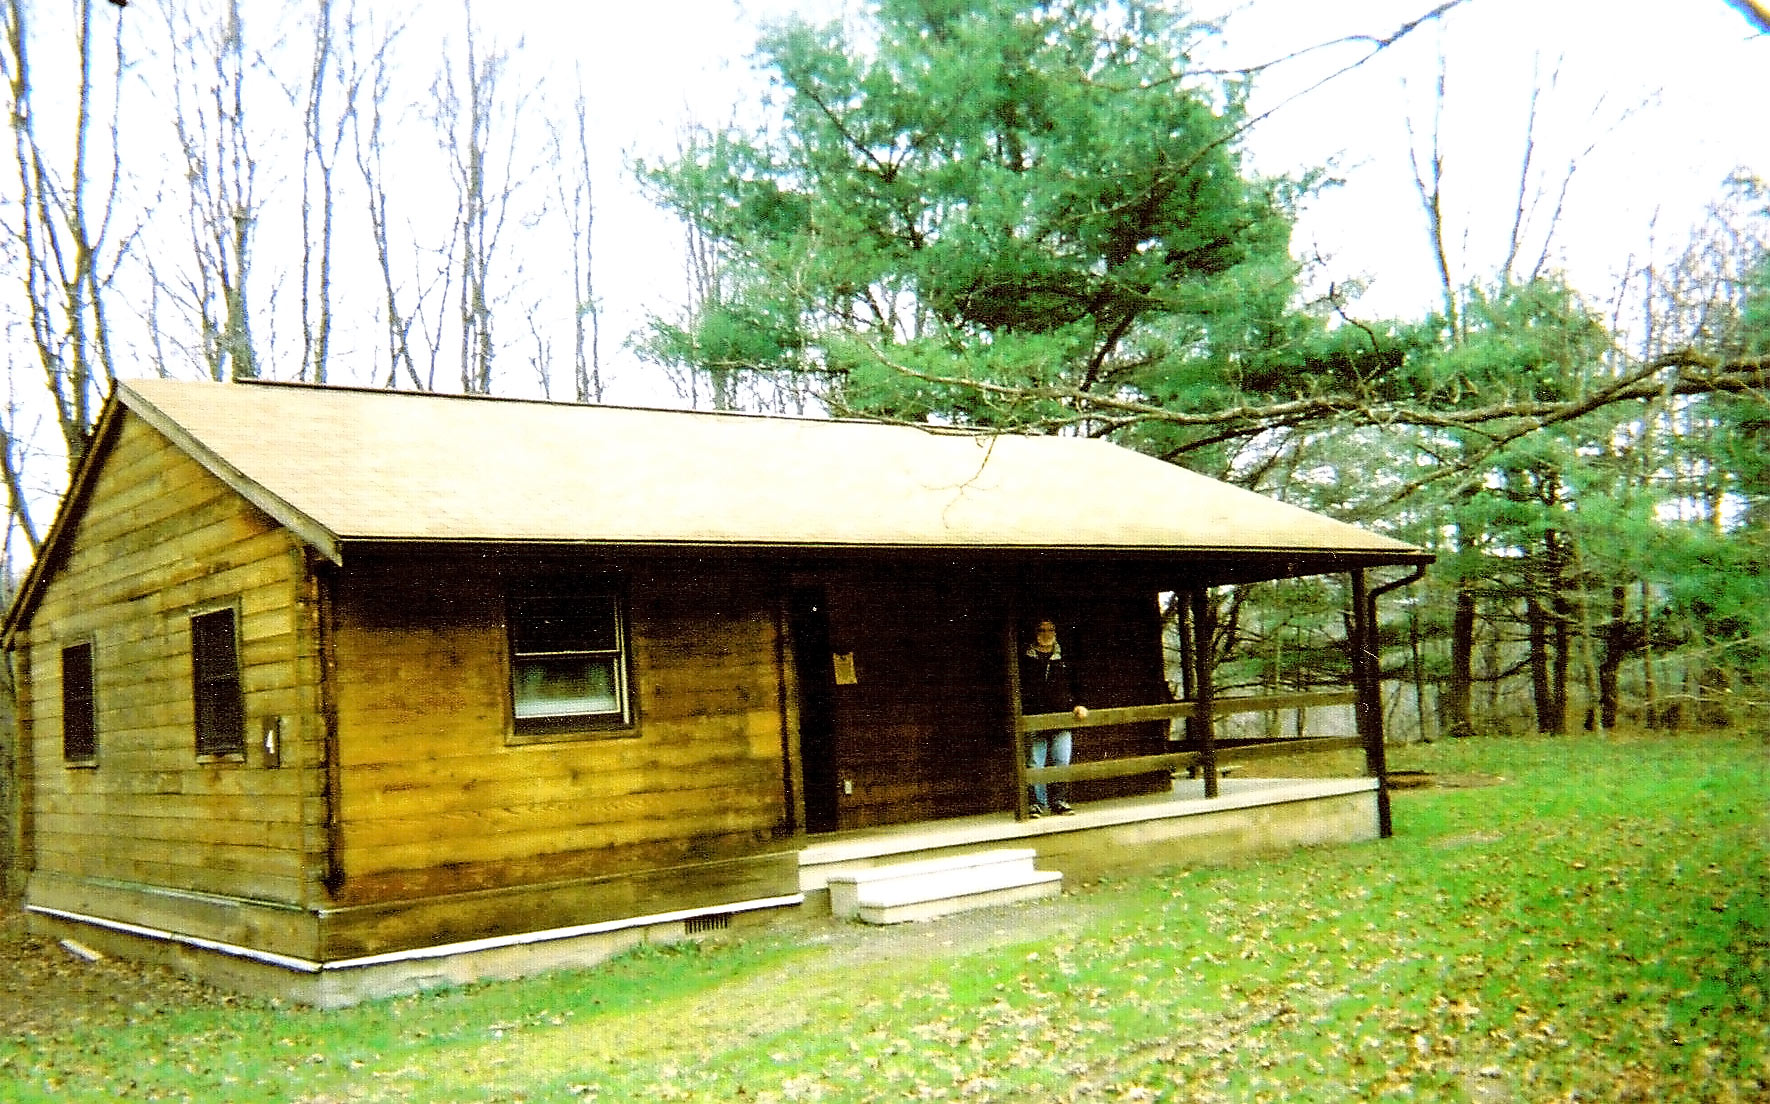 Keystone keystone state park cabins for Keystone colorado cabins